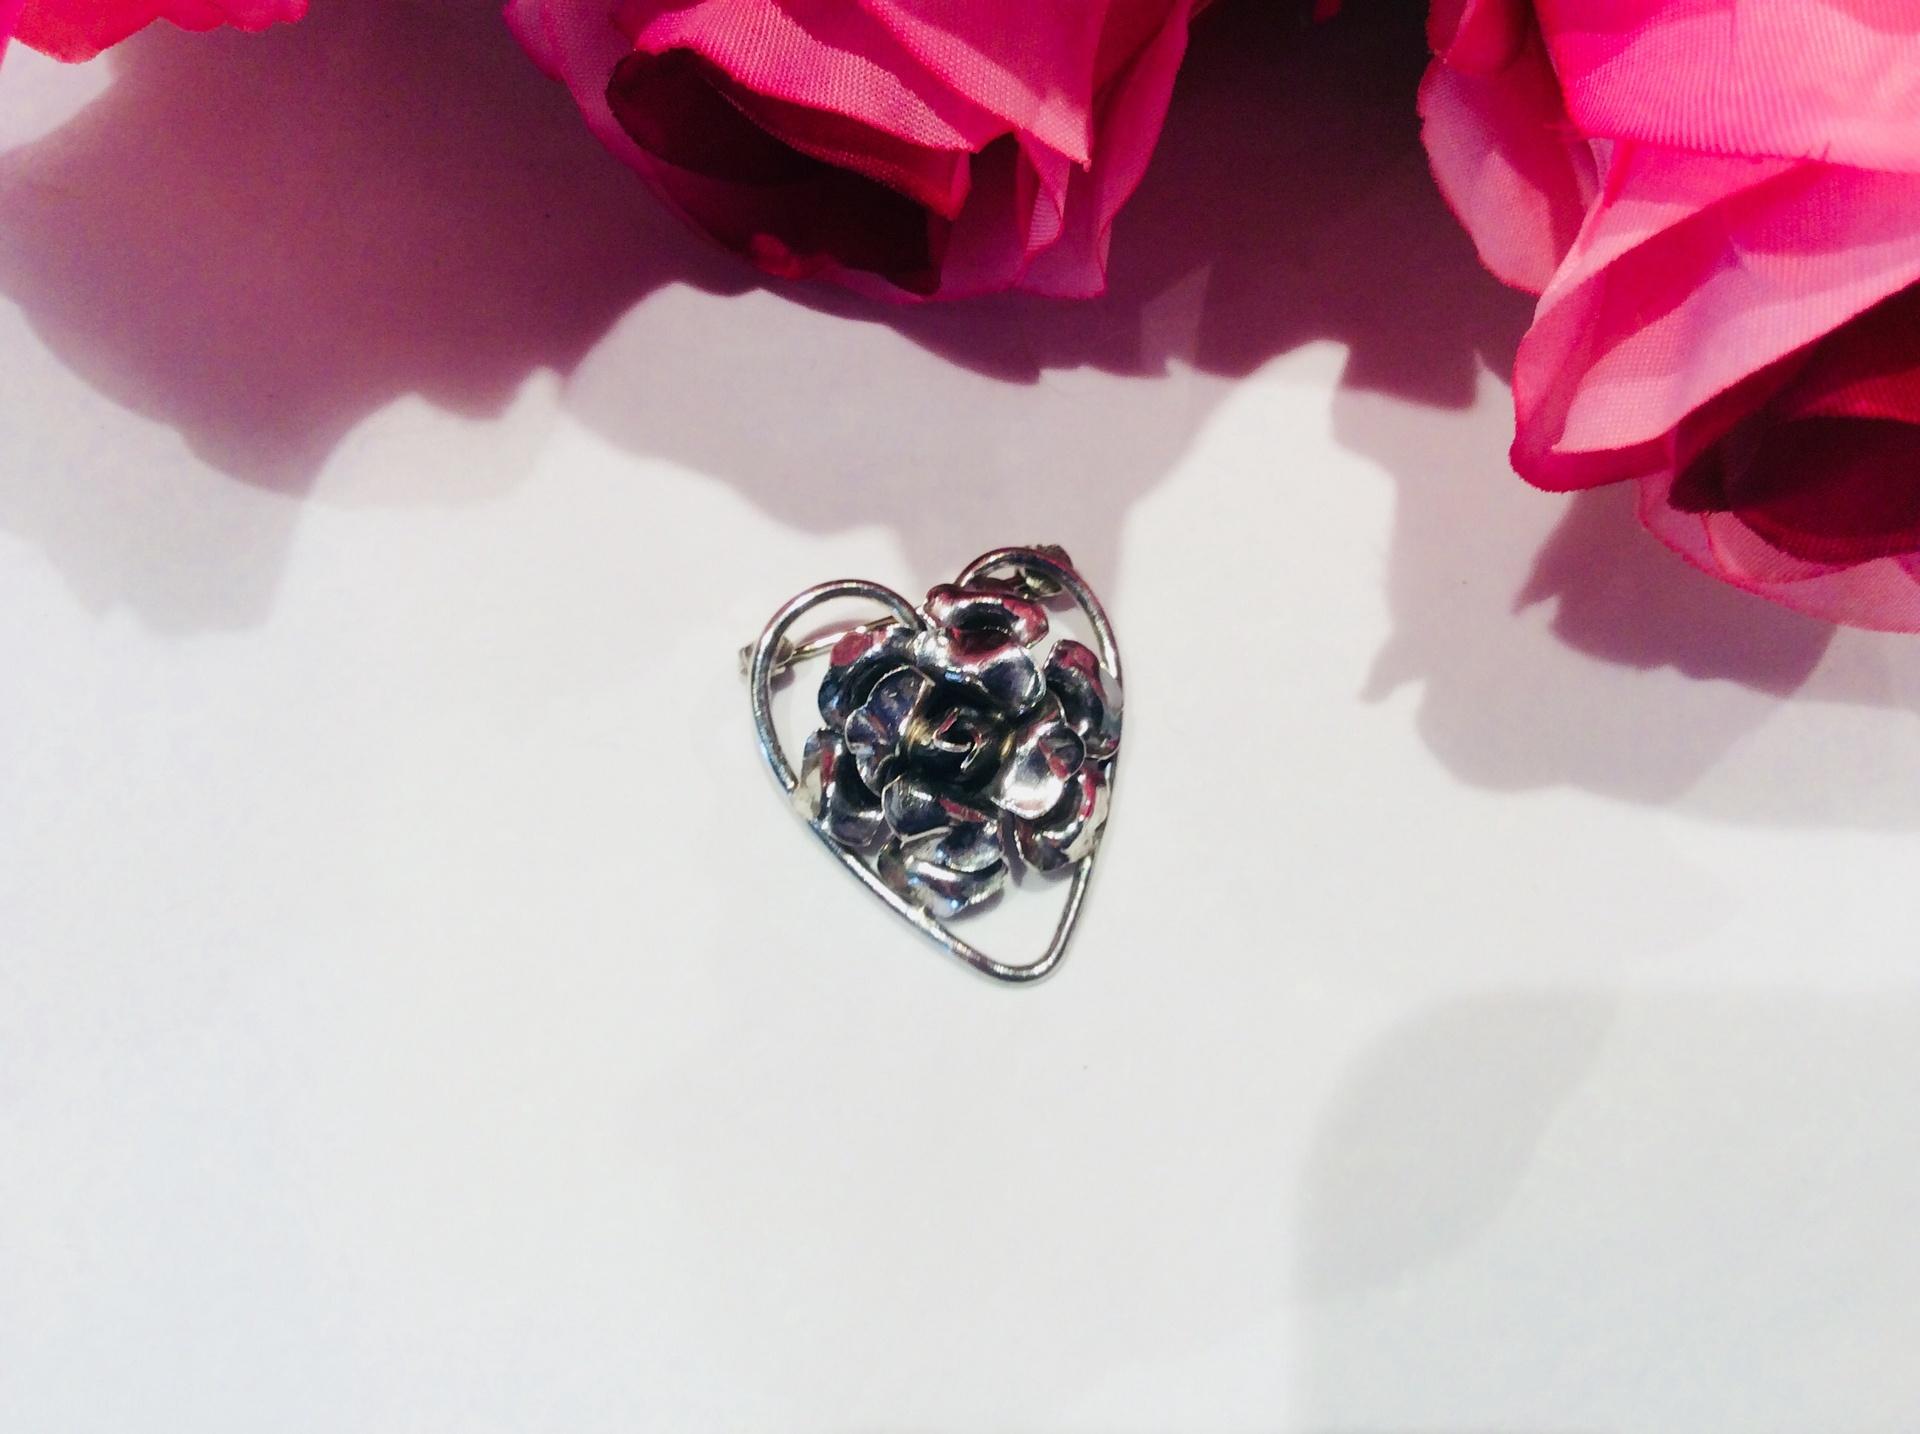 Vintage Sterling Silver Rose Heart Brooch